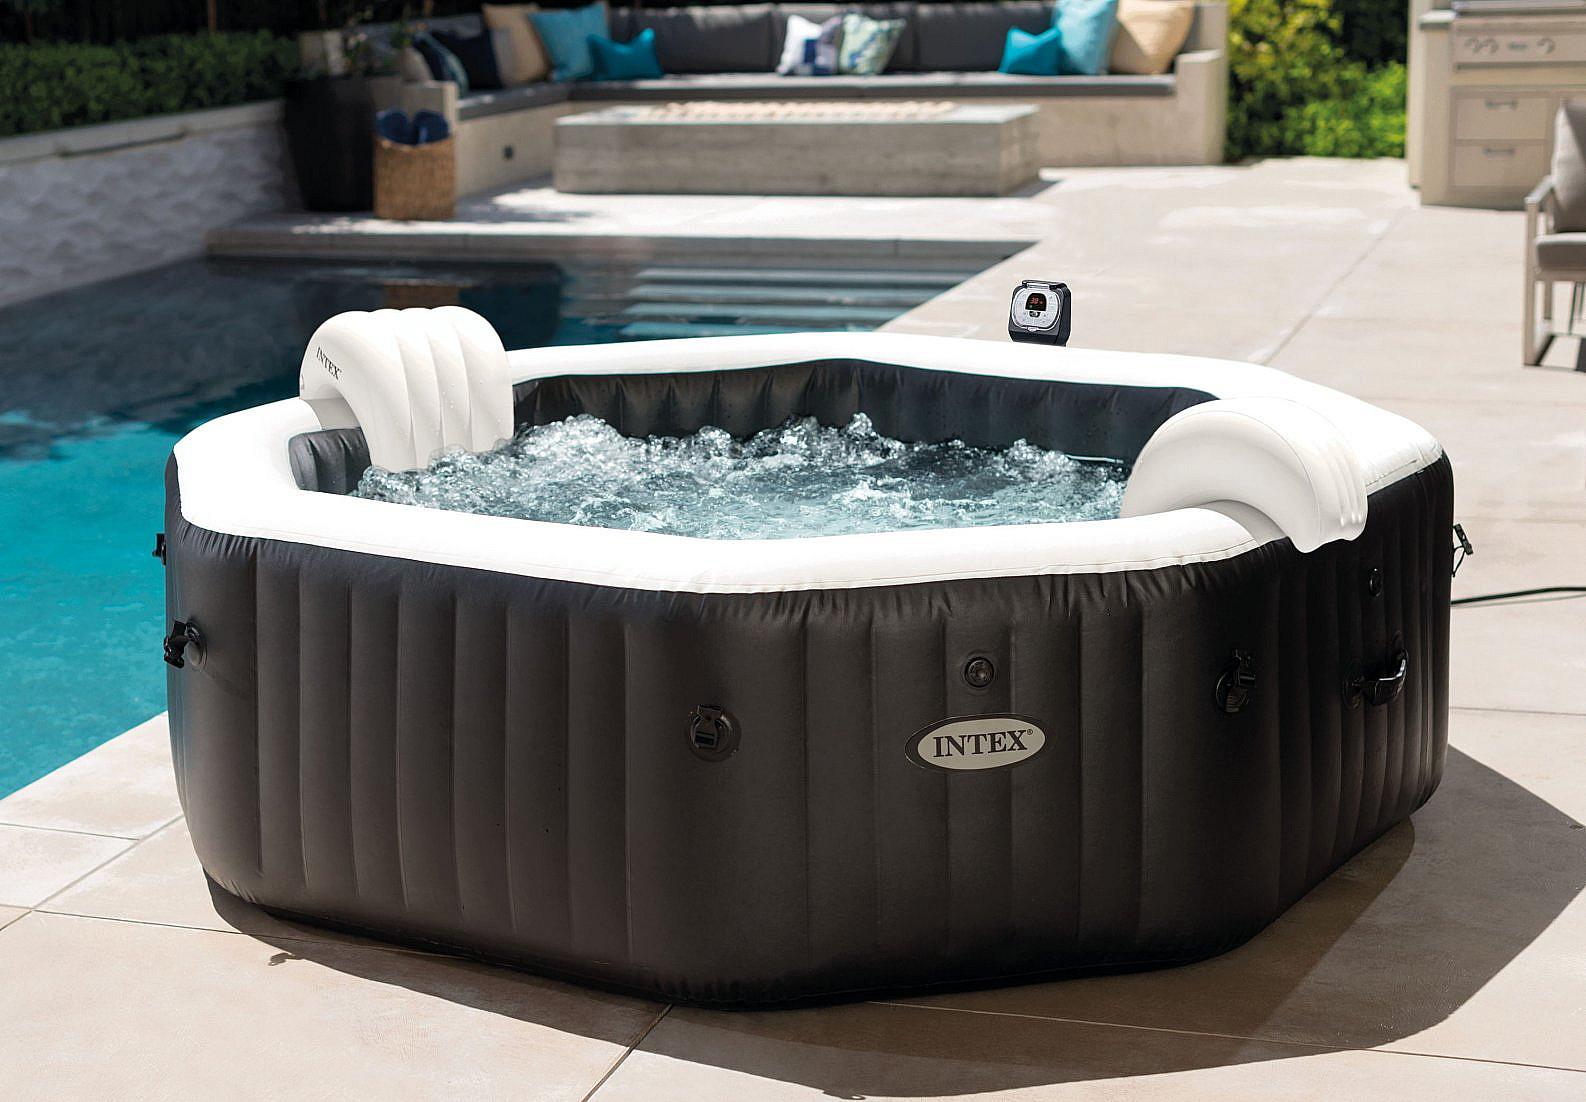 Nafukovacia vírivka Deluxe Octagon systém slanej vody pre 4 osoby (bublinky + masáž + trysky) 800L